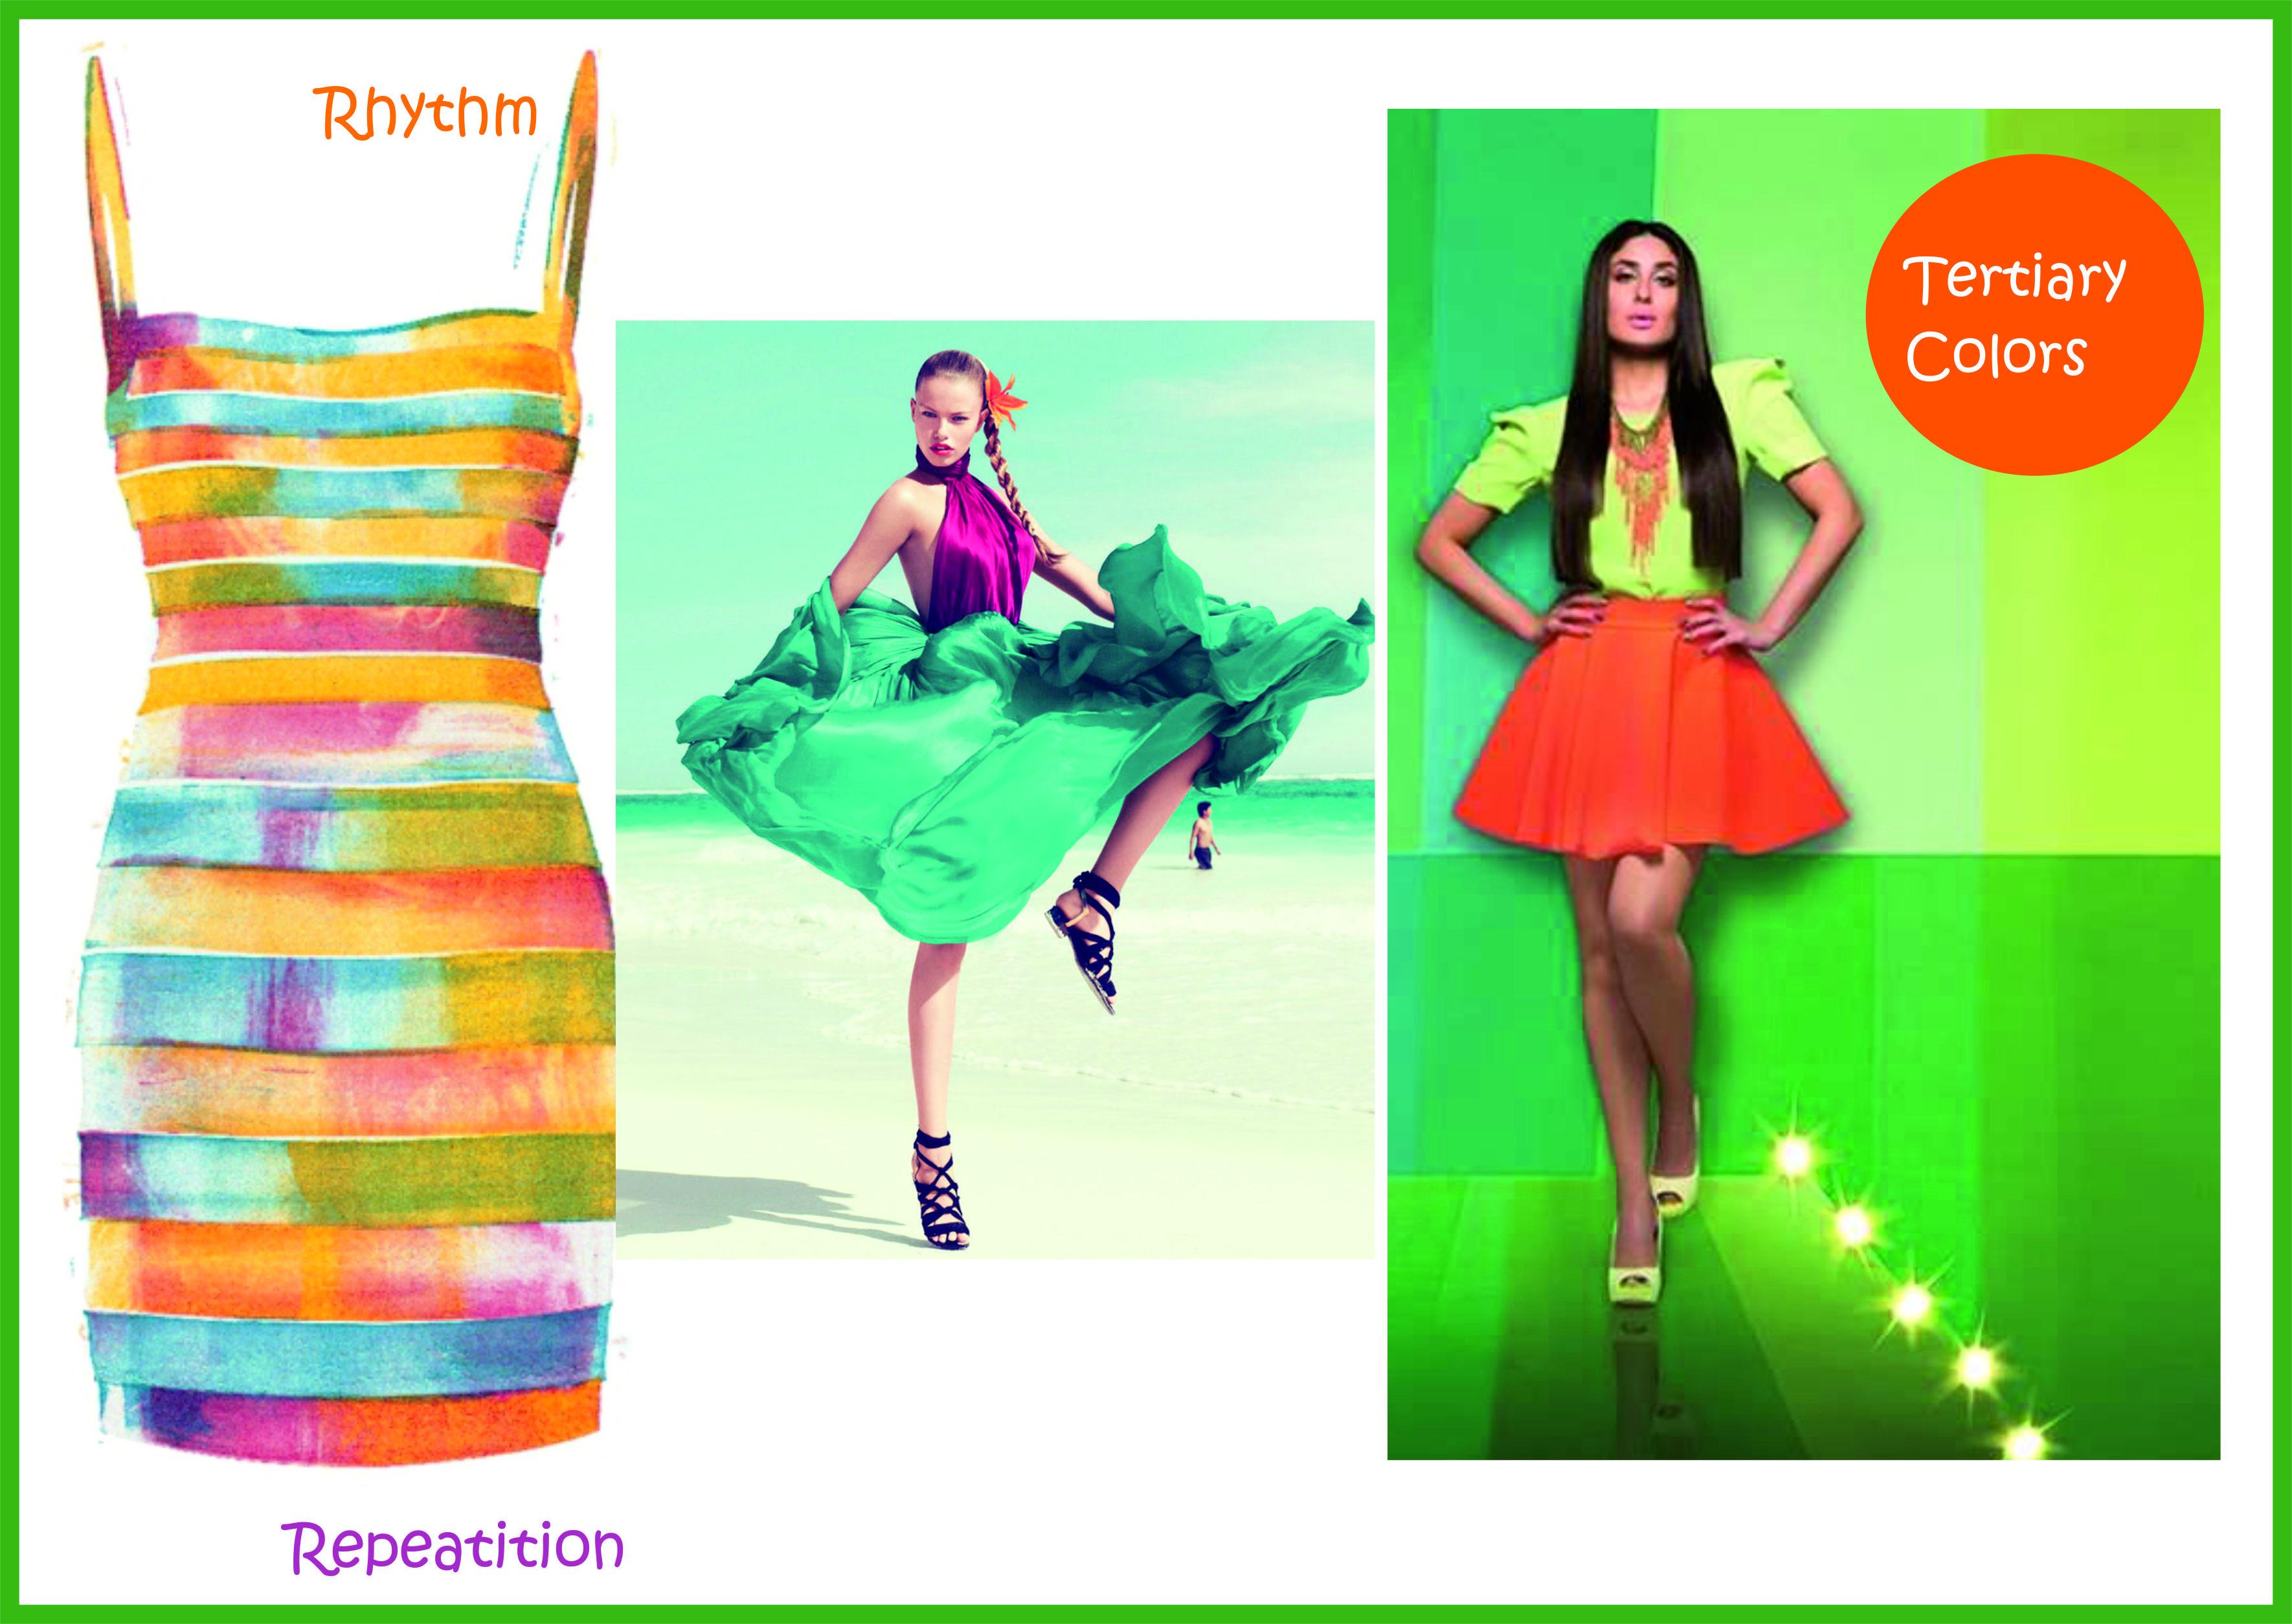 Pin By Tanvi Pinjarkar On Elements Of Design In Fashion Elements Of Design Tertiary Color Color